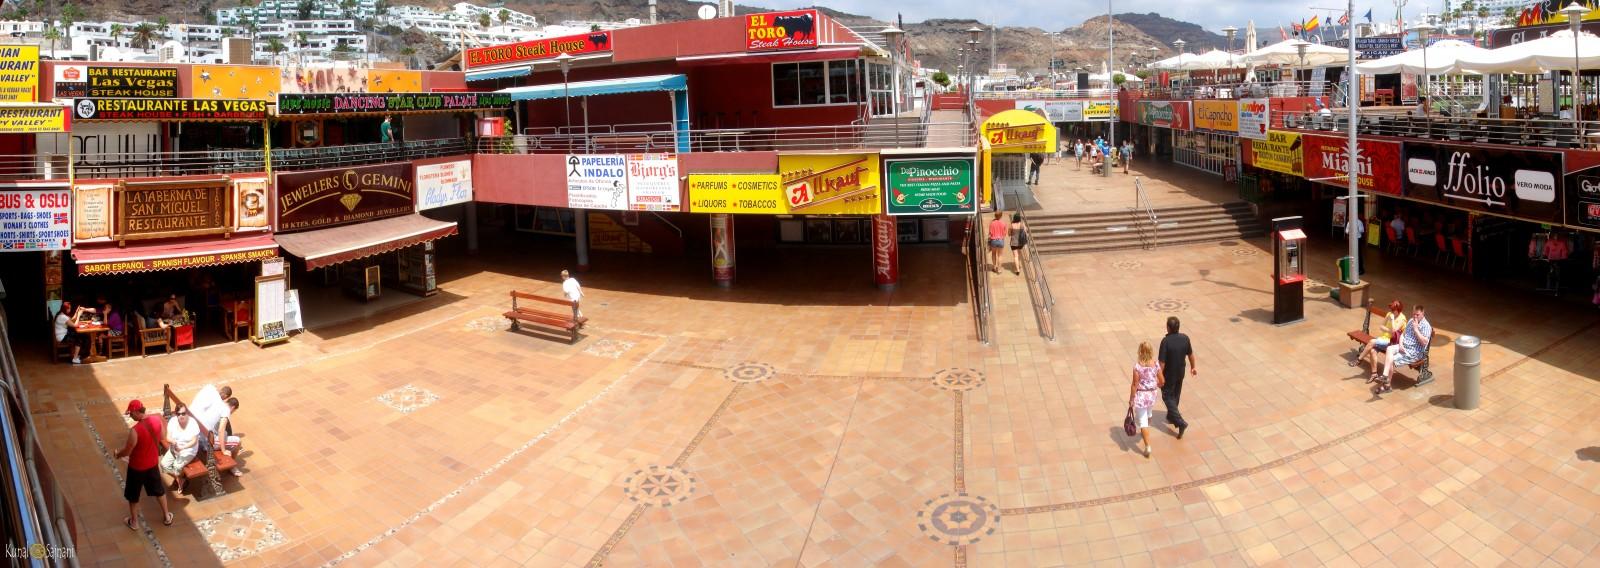 Centro Comercial Puerto Rico Gran Canaria Mogan